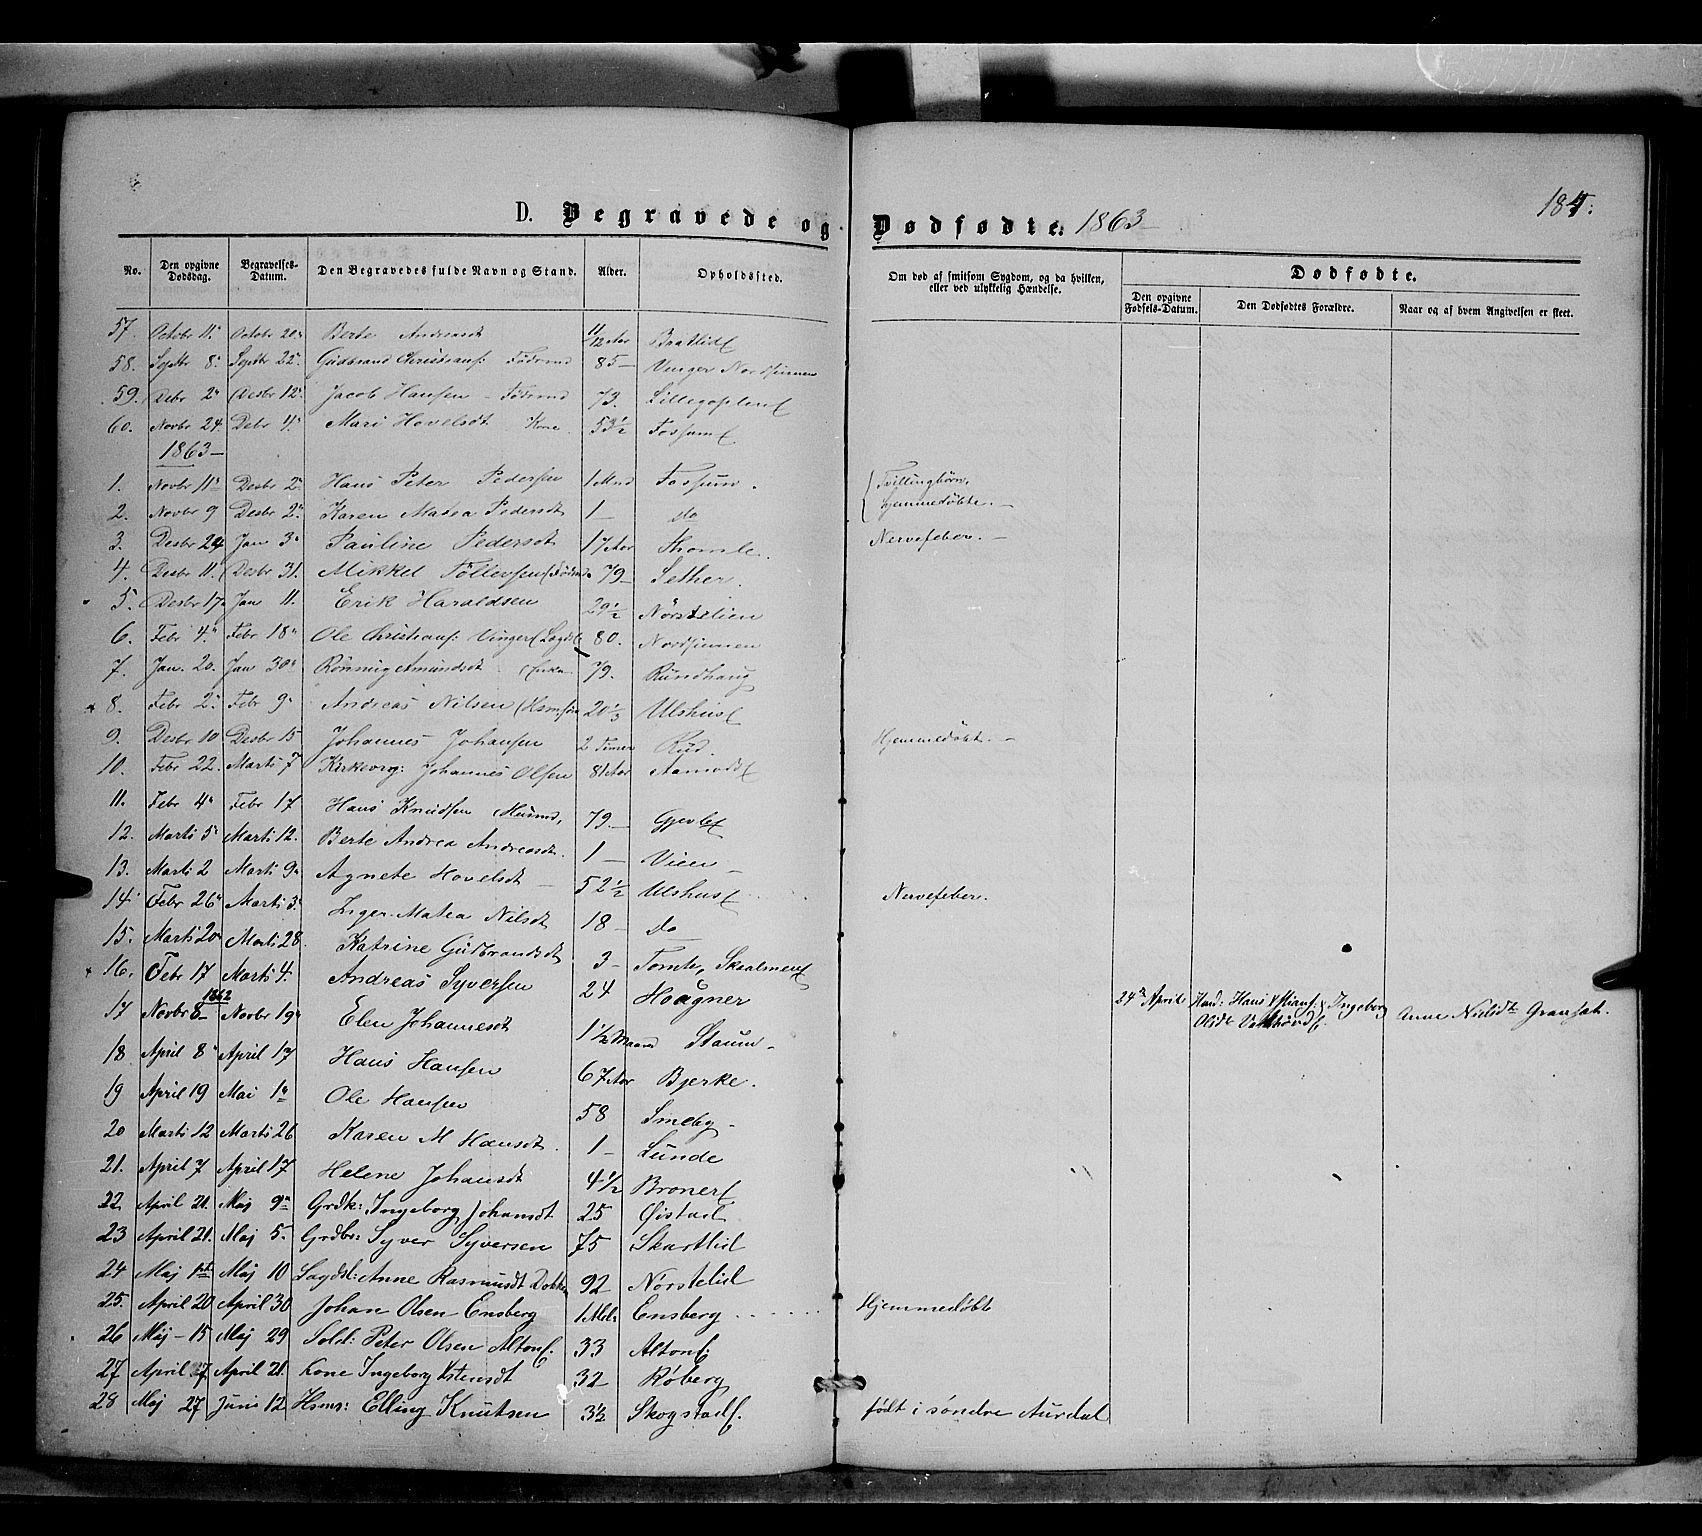 SAH, Nordre Land prestekontor, Ministerialbok nr. 1, 1860-1871, s. 184